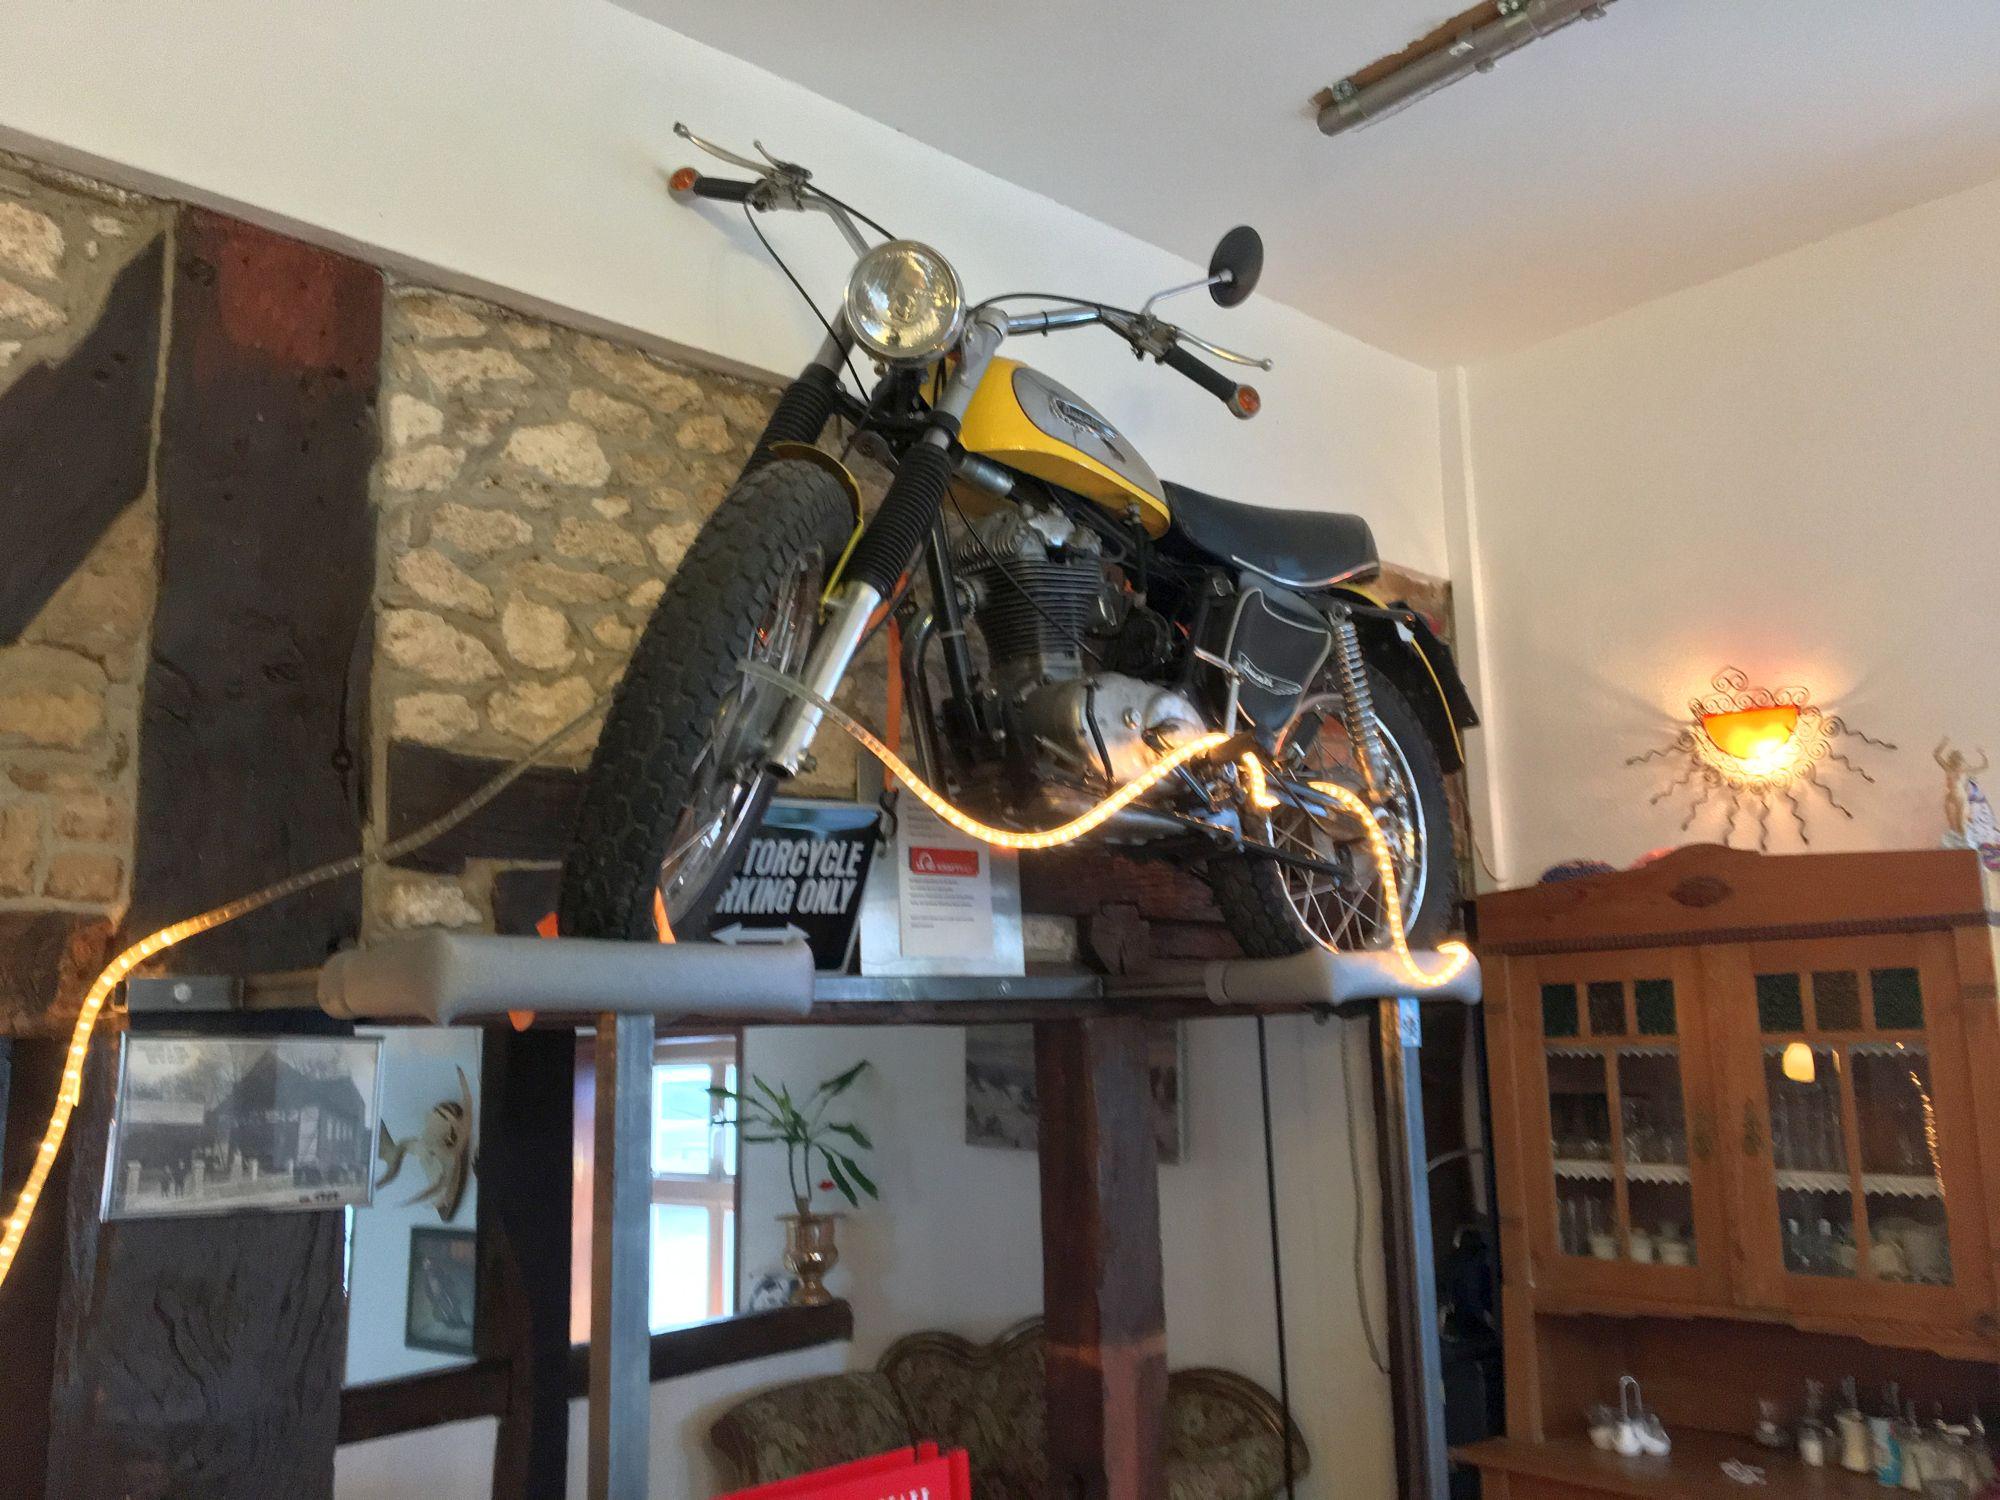 Noerdliches_Harzvorland_Reitlingstal_Elm_Cafe_Vintage_innen_bike_1